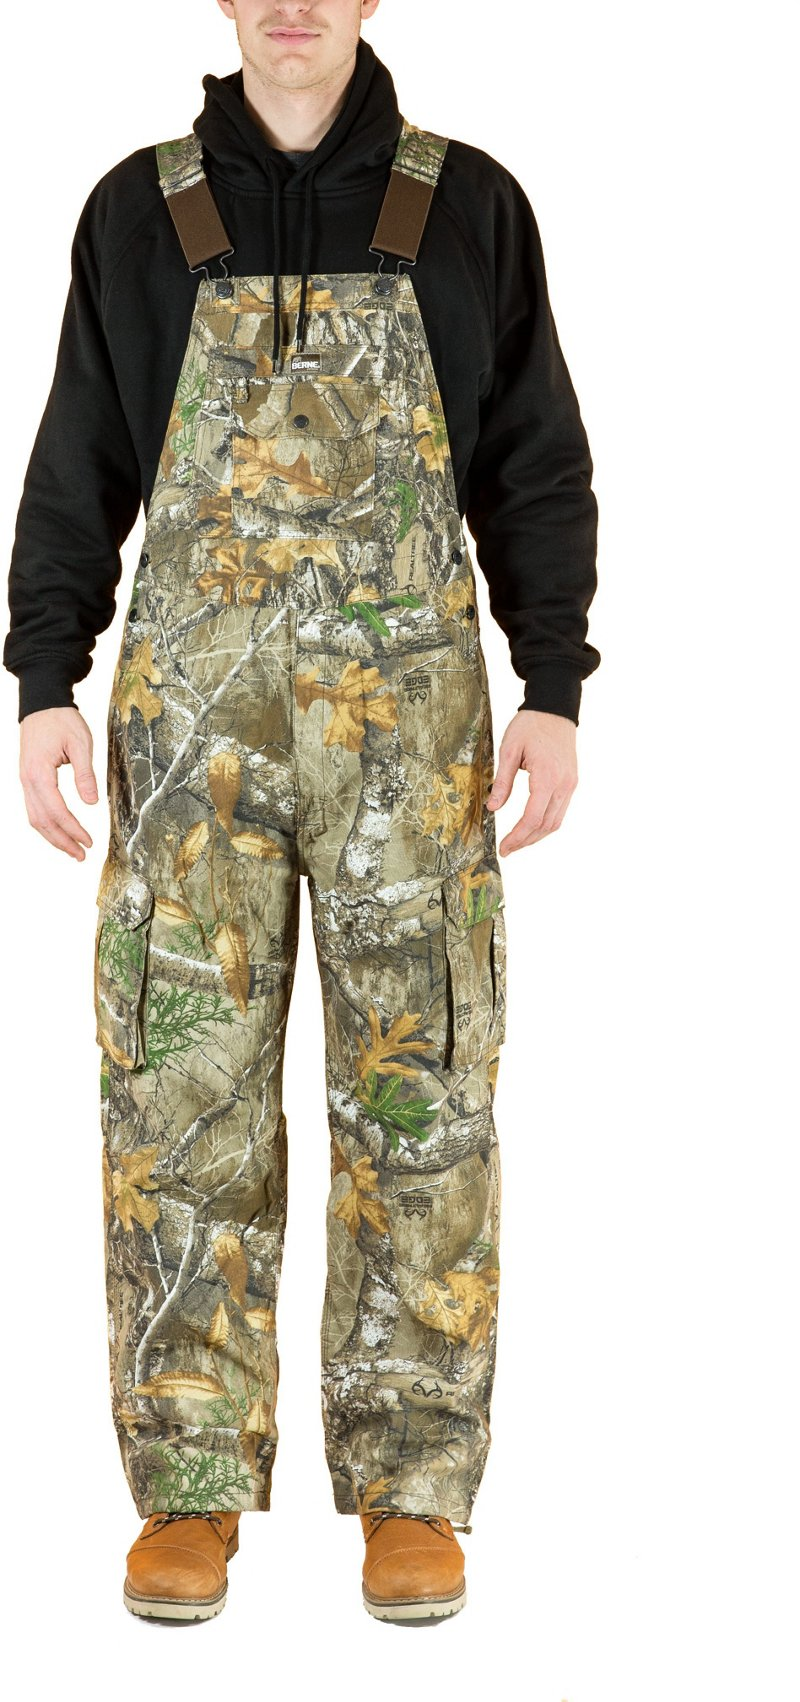 Berne Men's Bantam Bib Overalls - Camo Clothing, Adult Insulated Camo at Academy Sports thumbnail